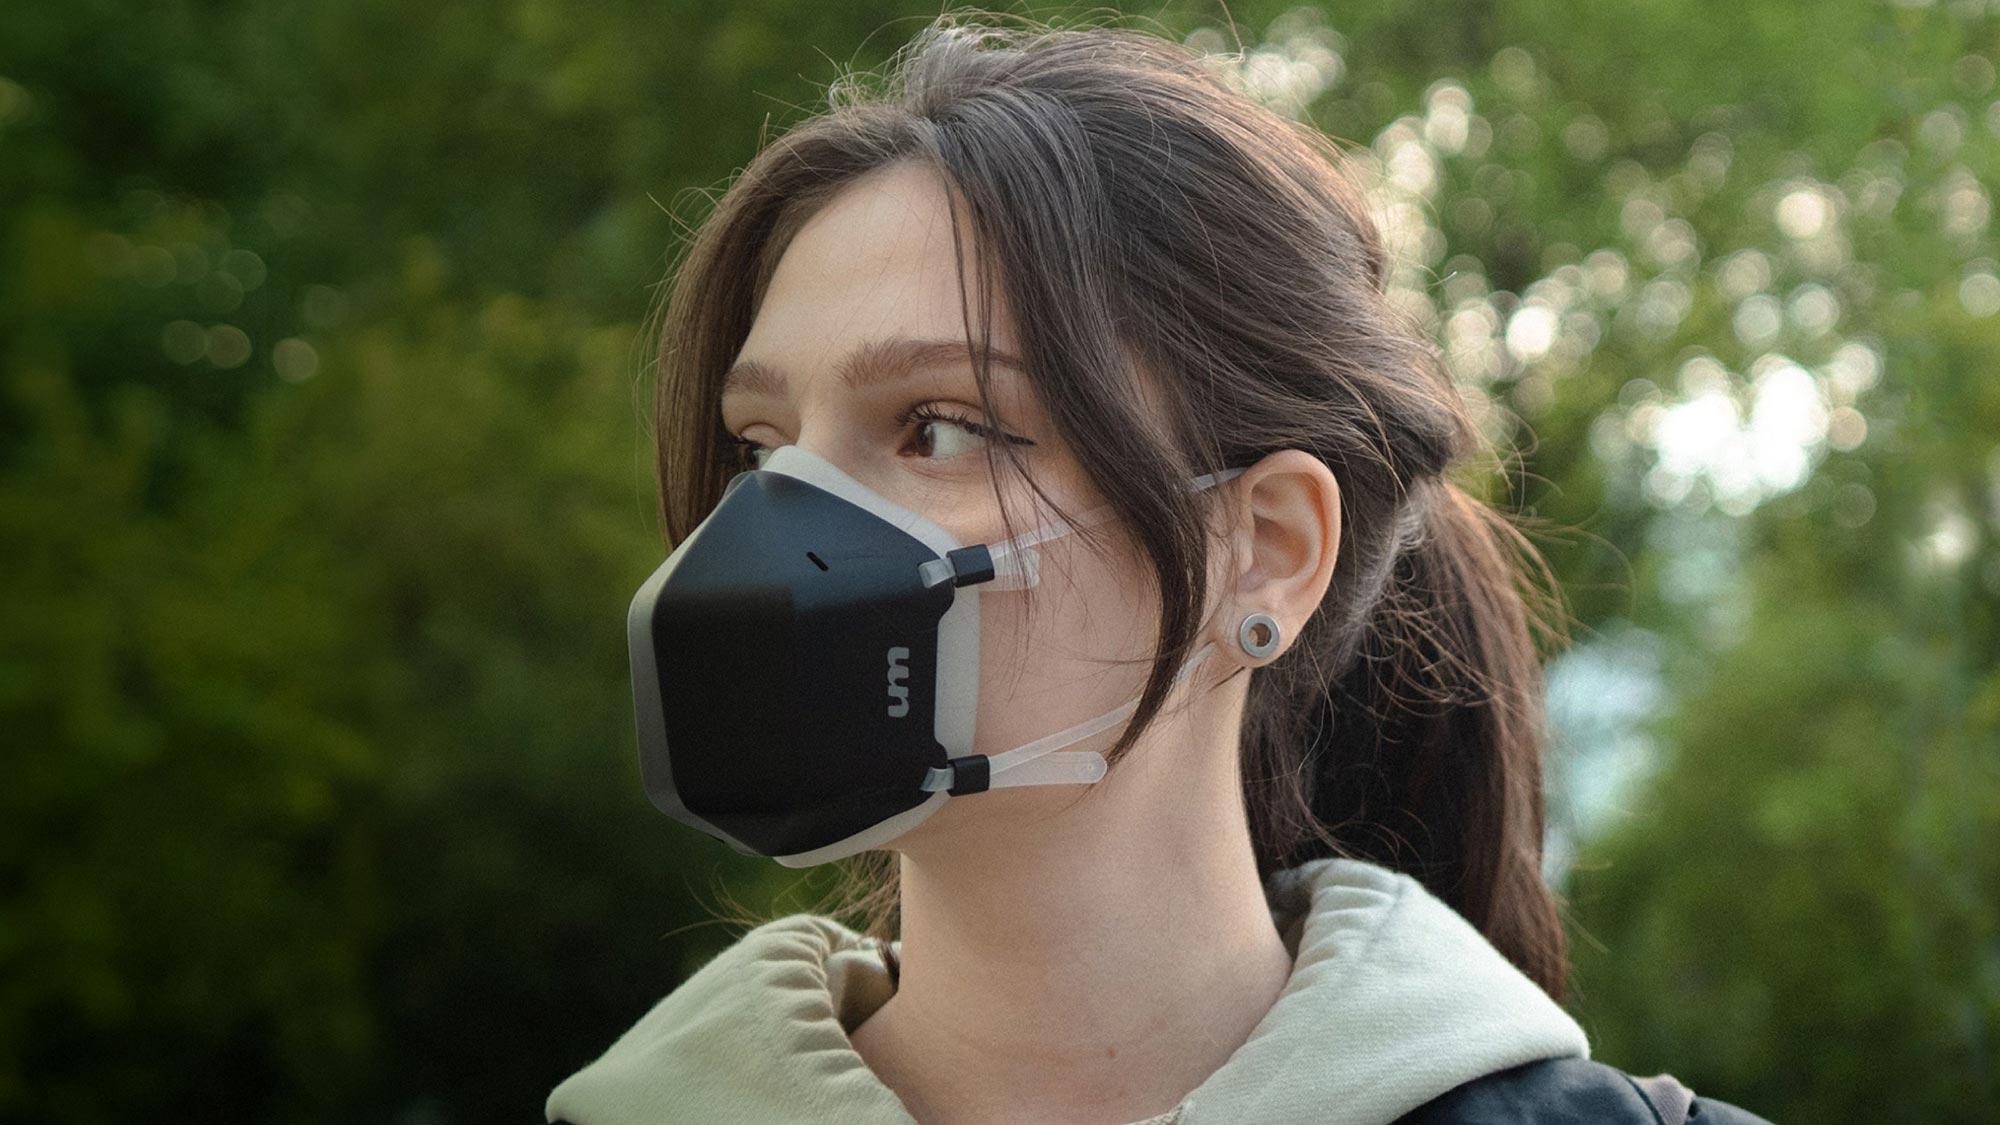 Uvmask Is A High Tech Face Mask That Features Consumer Grade Uv C Technology Shouts